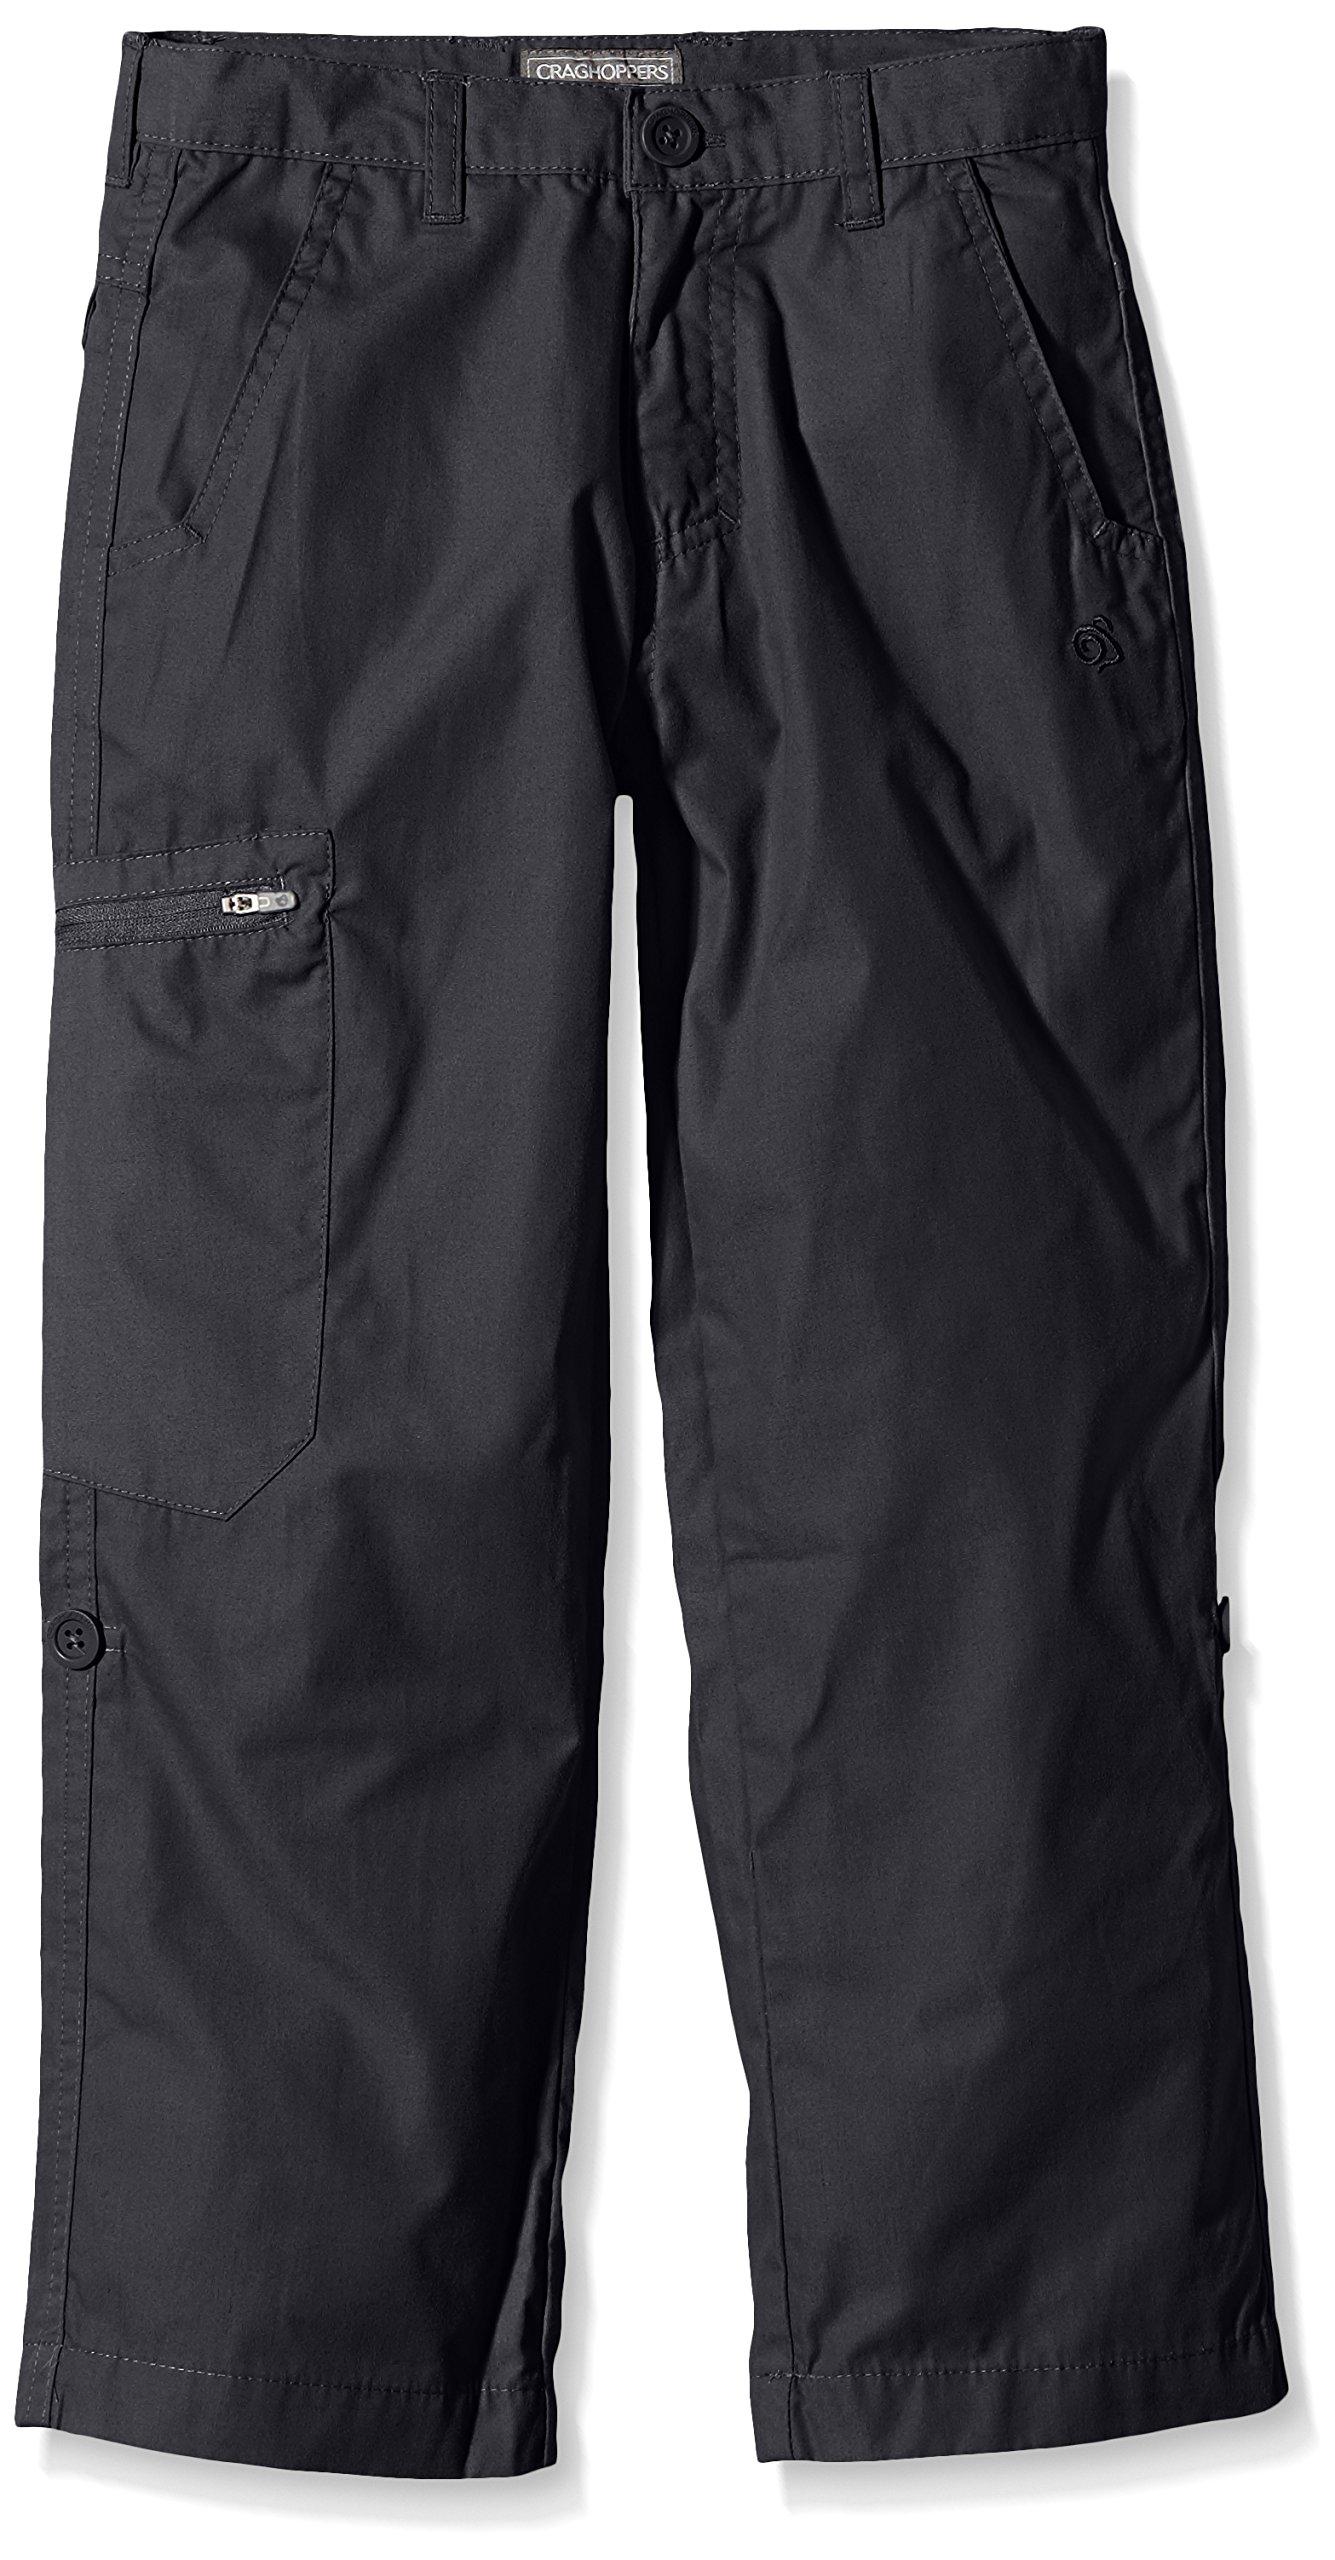 Craghoppers Kids Kiwi Trousers Pants, Navy, Size 7-8